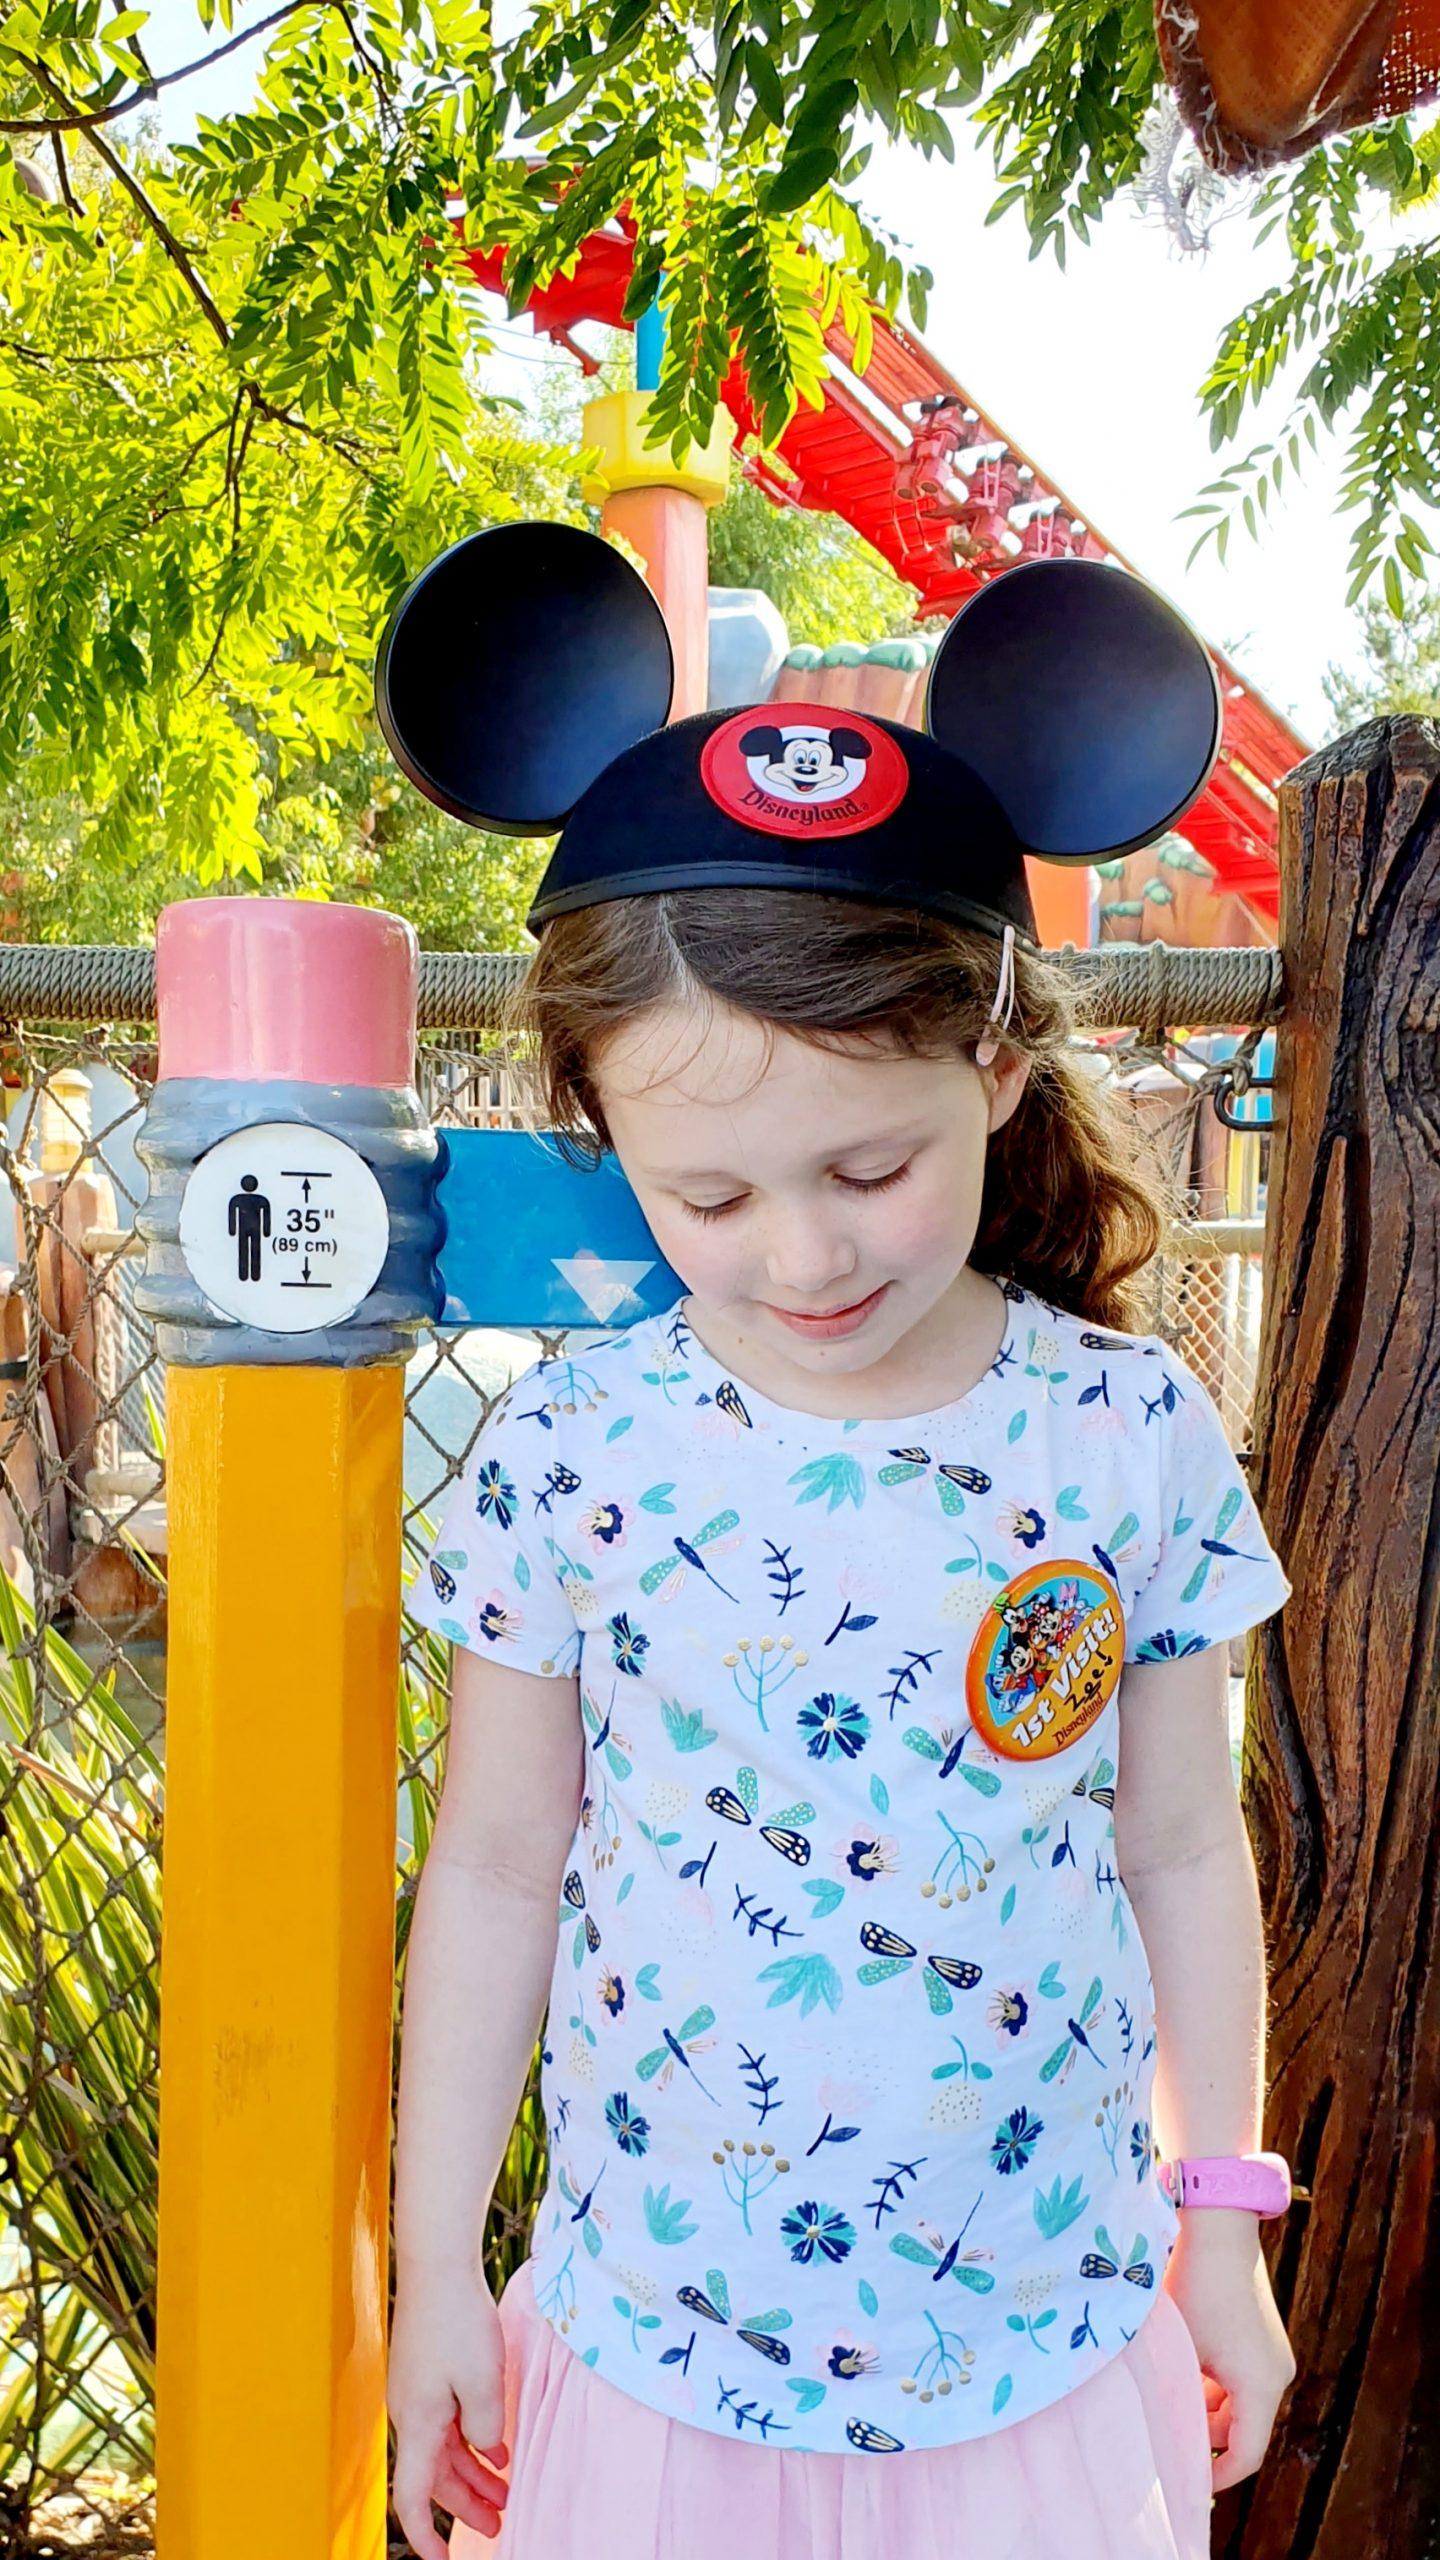 Disneyland Mickey's Toontown